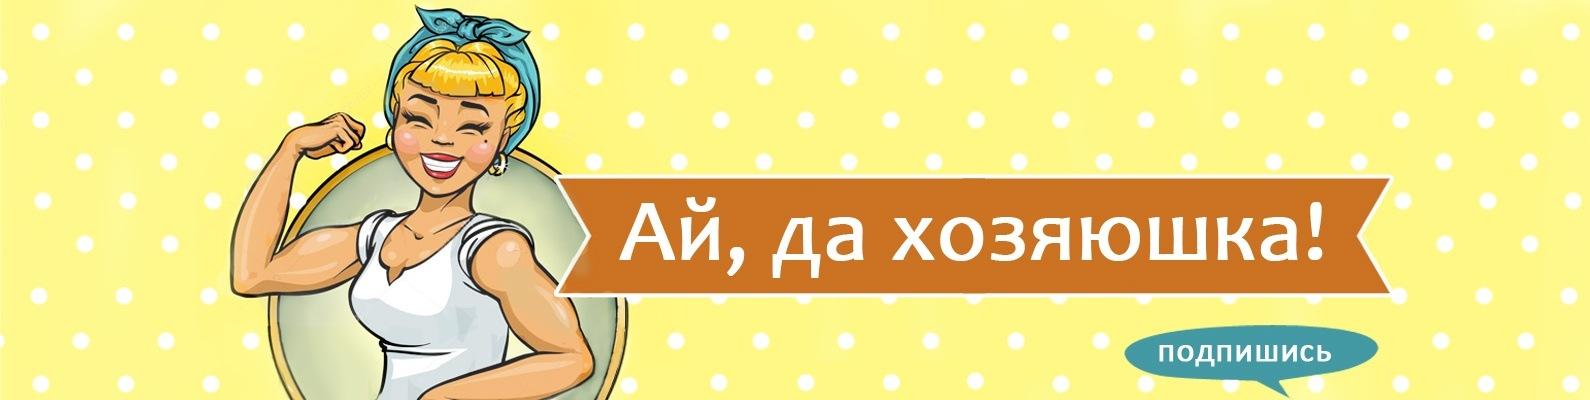 Ай, да хозяюшка   ВКонтакте